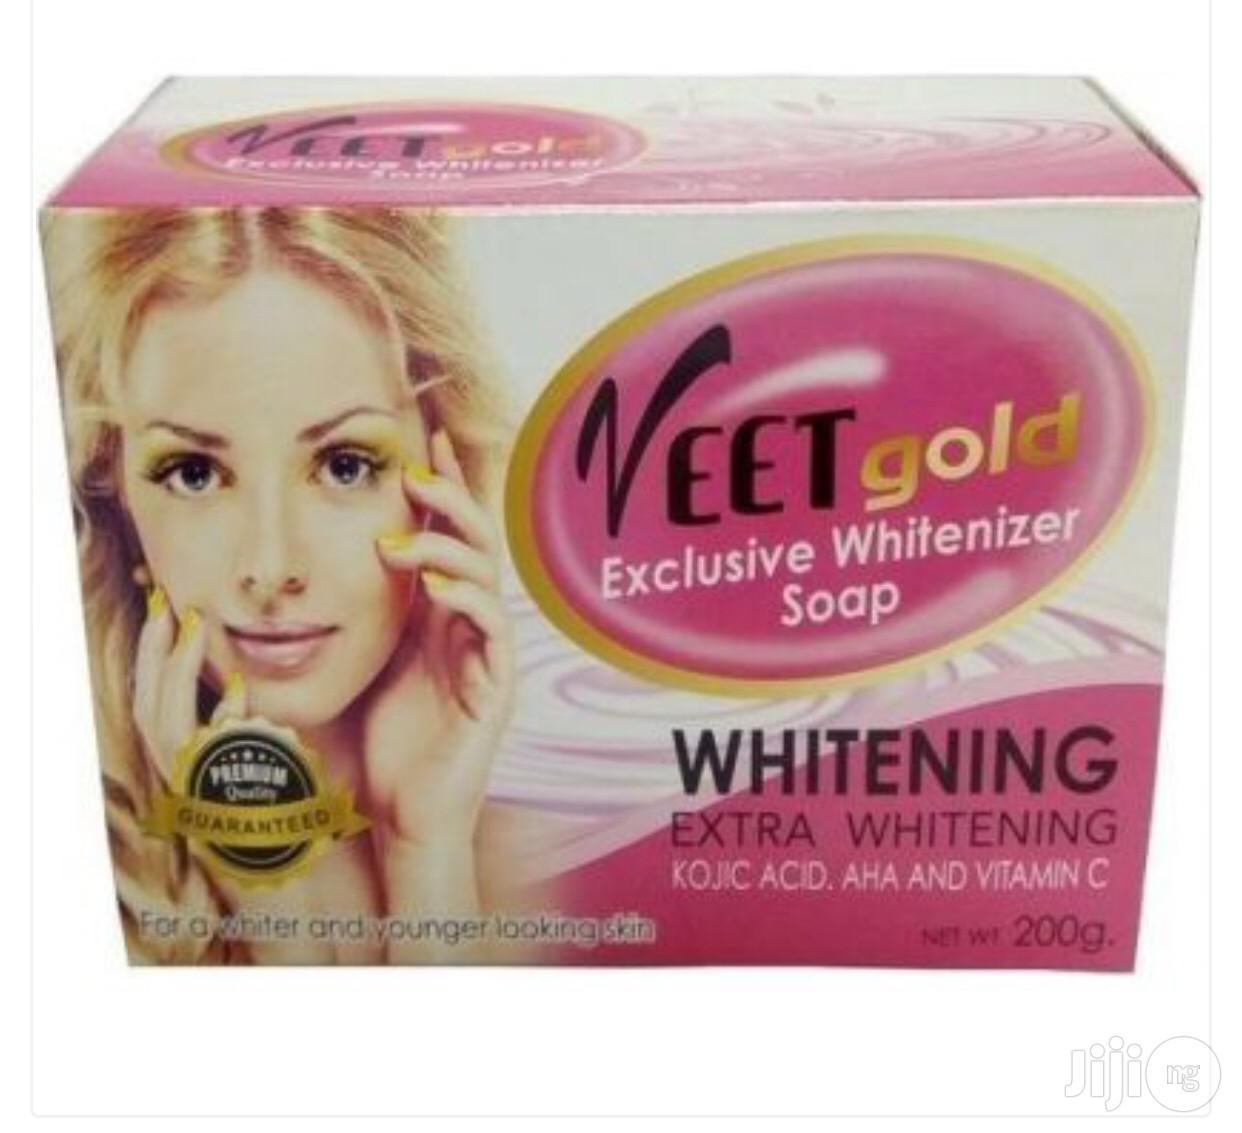 Veetgold Soap